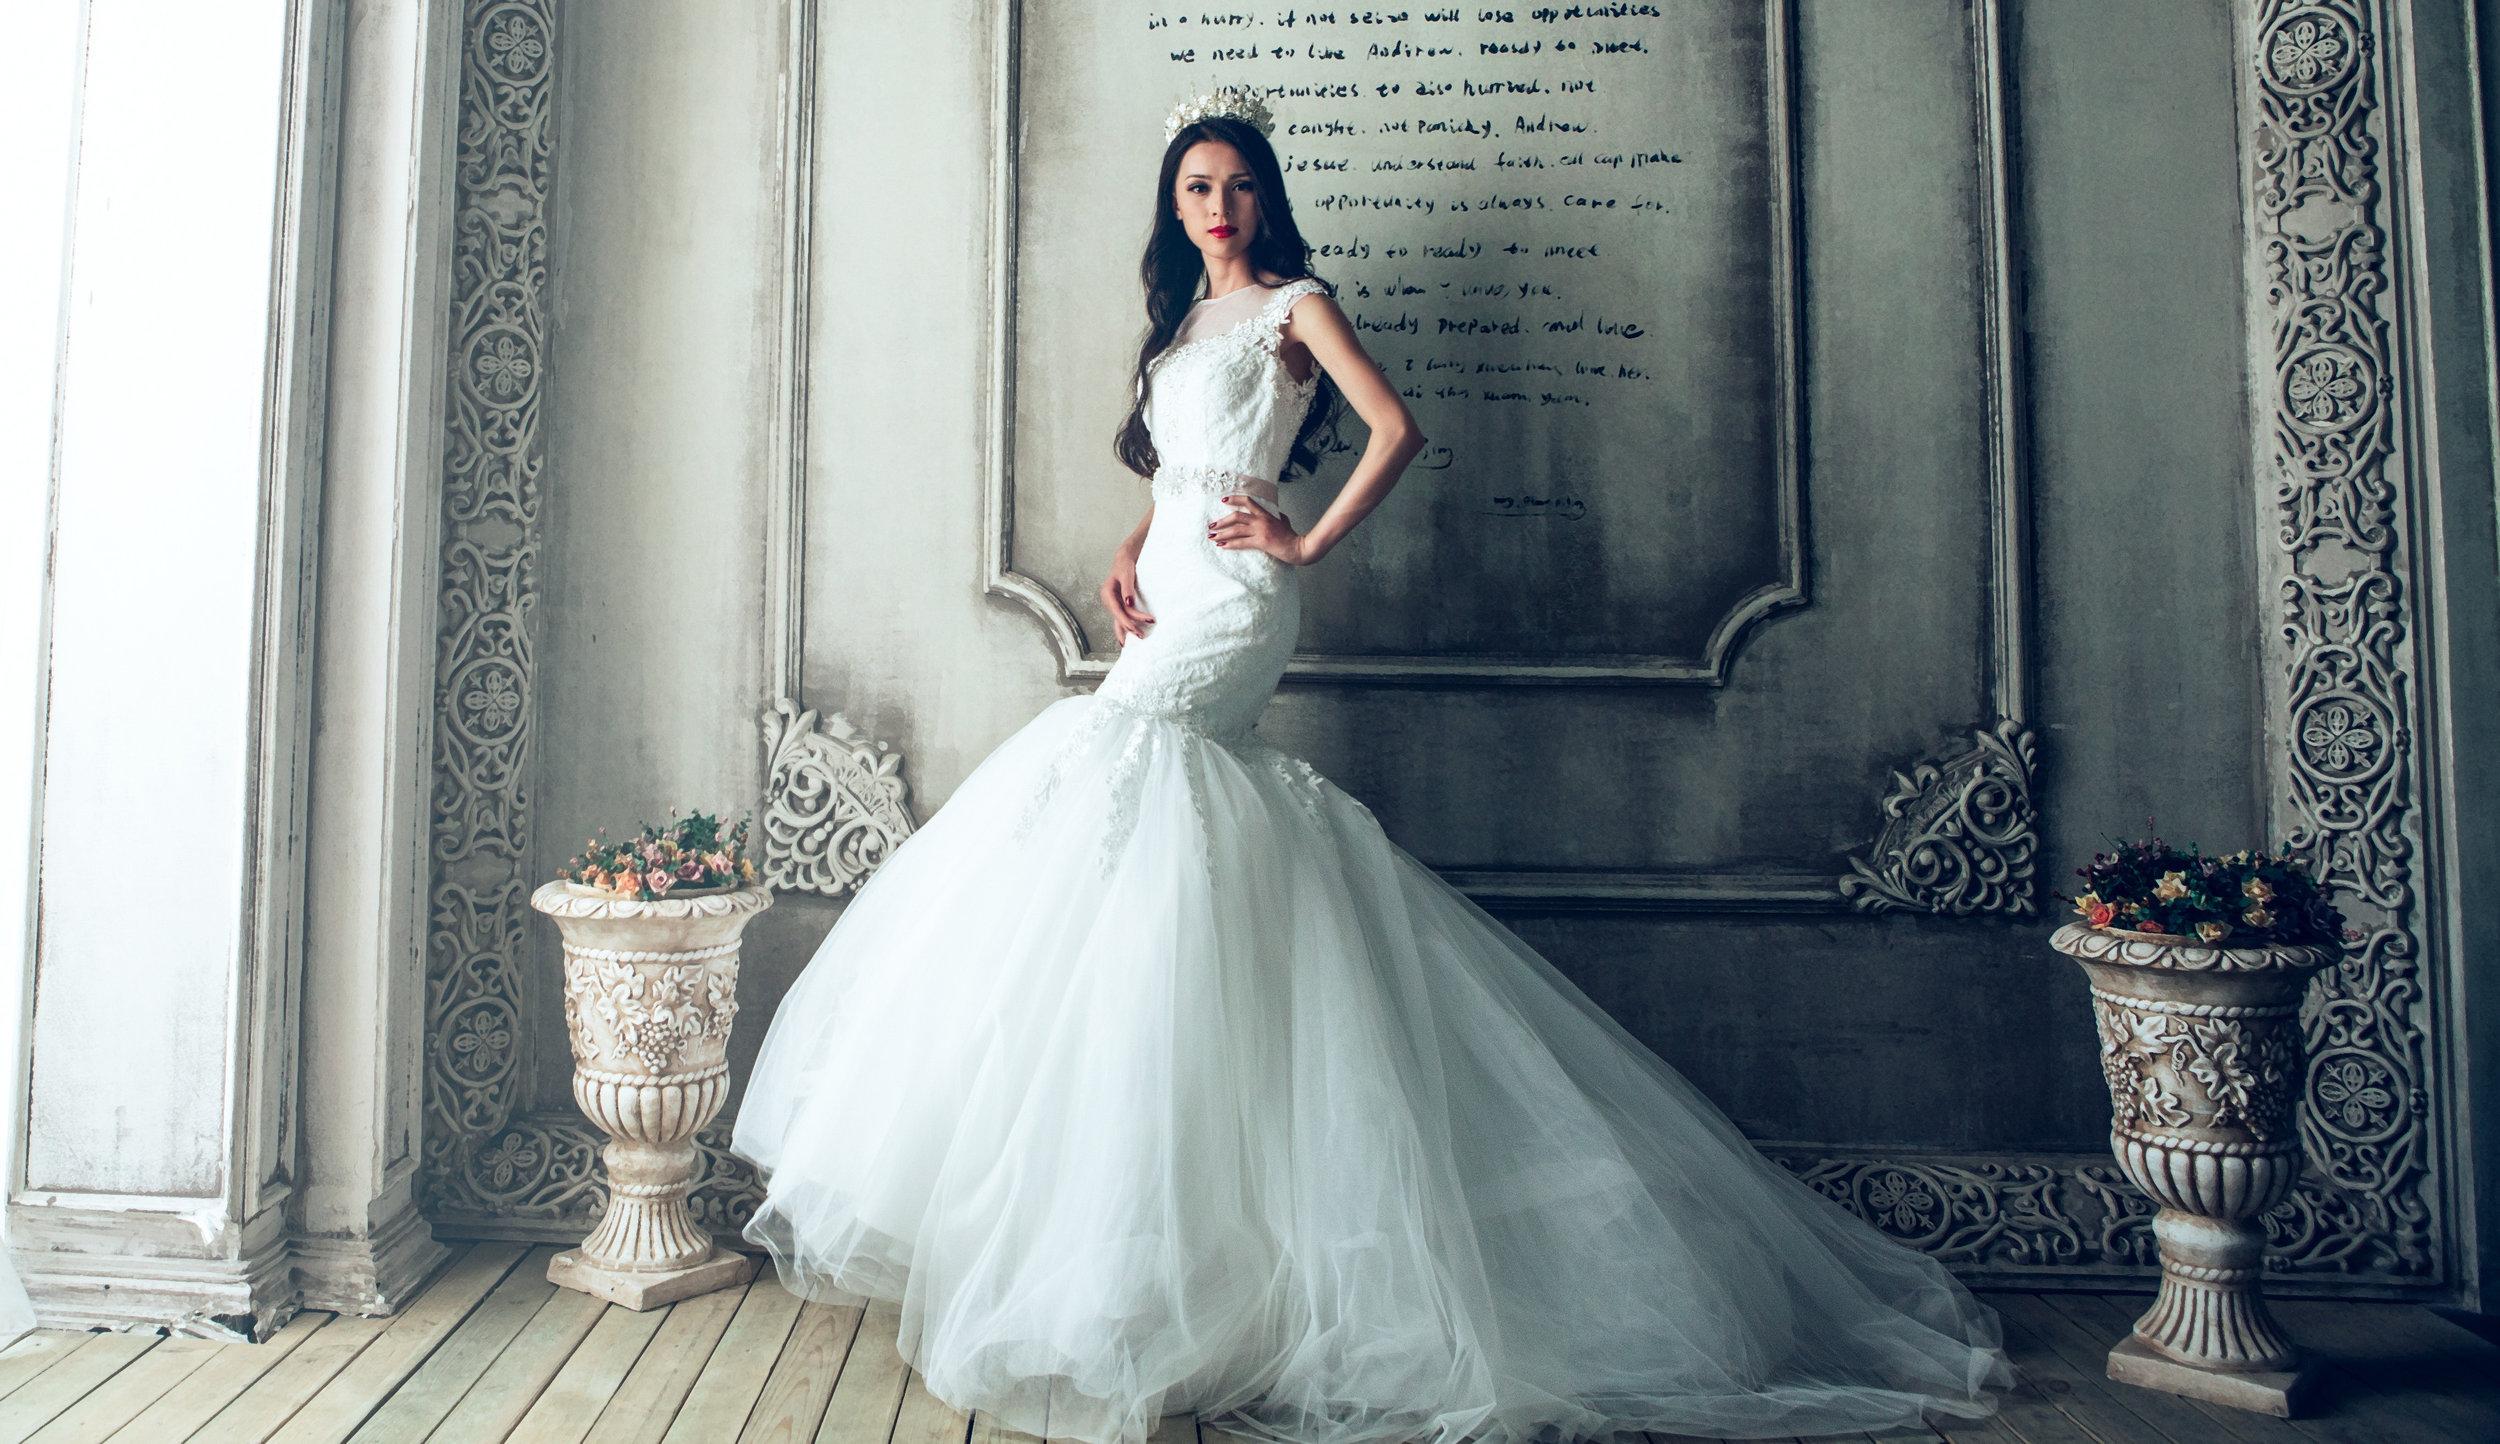 adult-bridal-bride-265720 (1).jpg